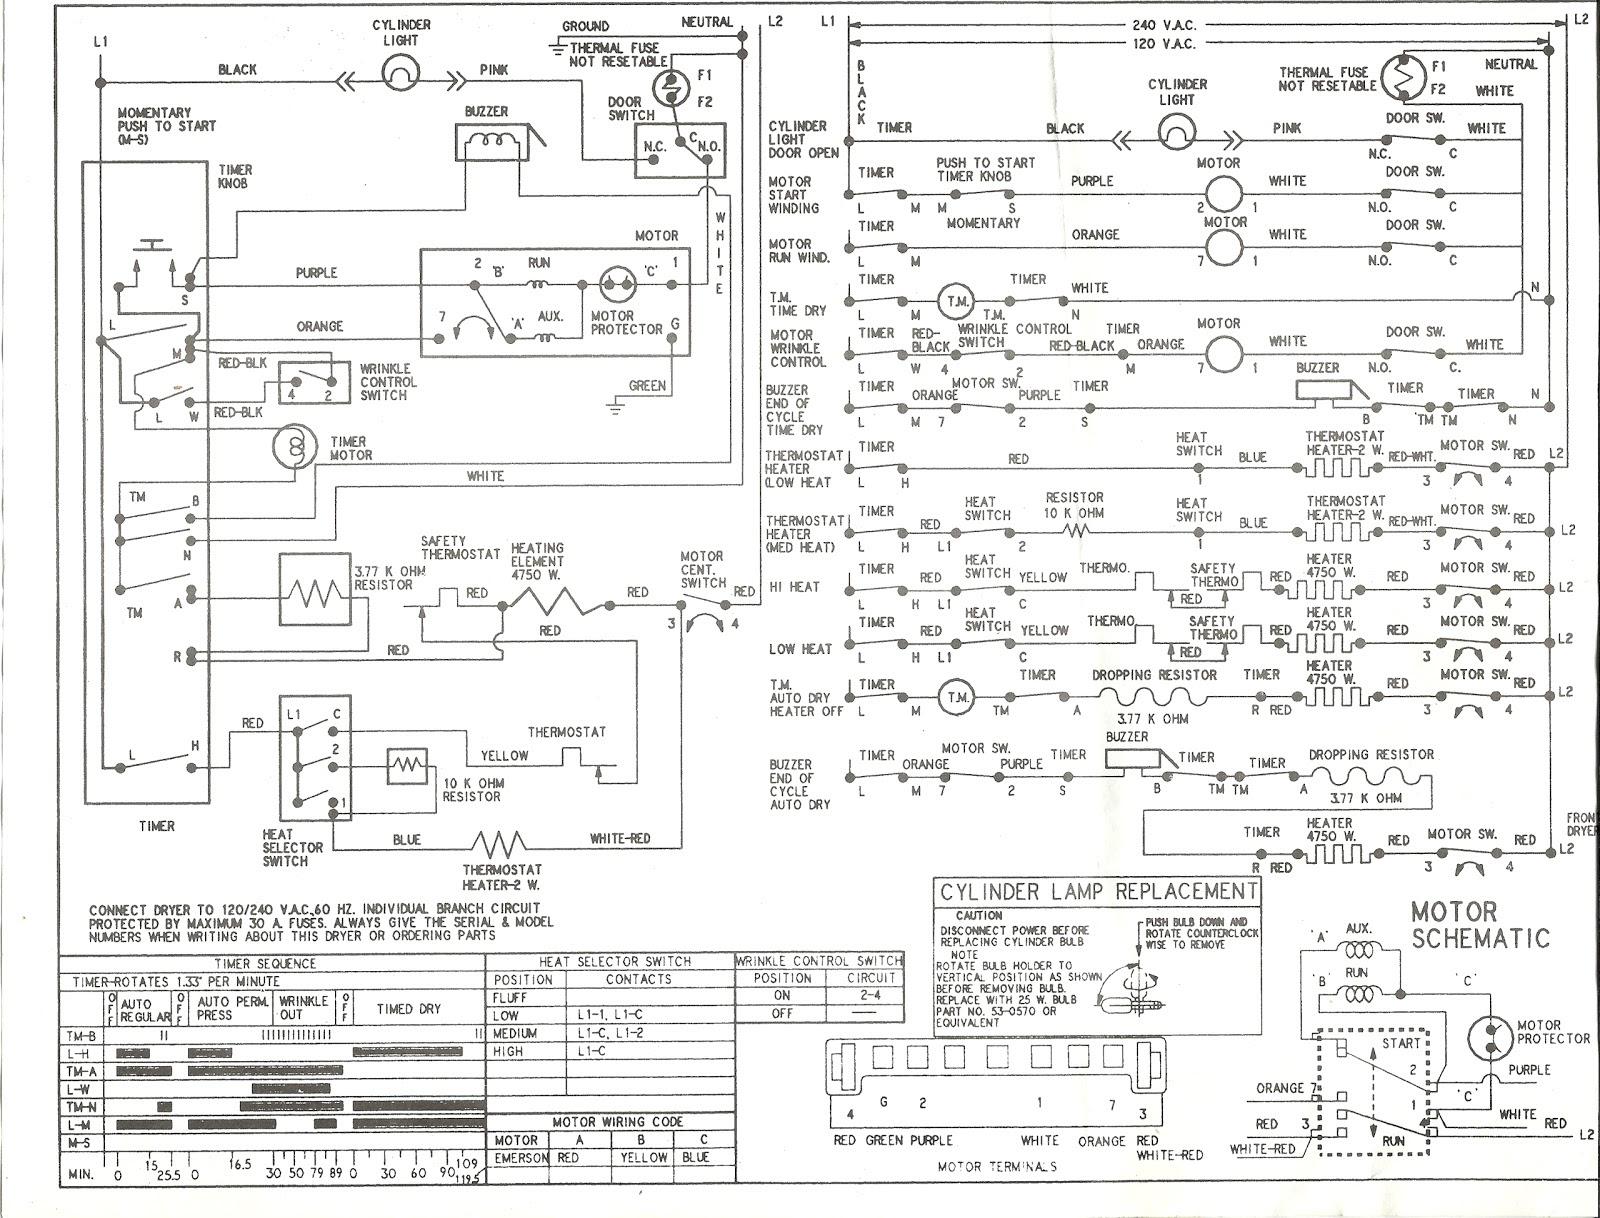 Appliance Talk Kenmore Series Electric Dryer Wiring Diagram Schematic